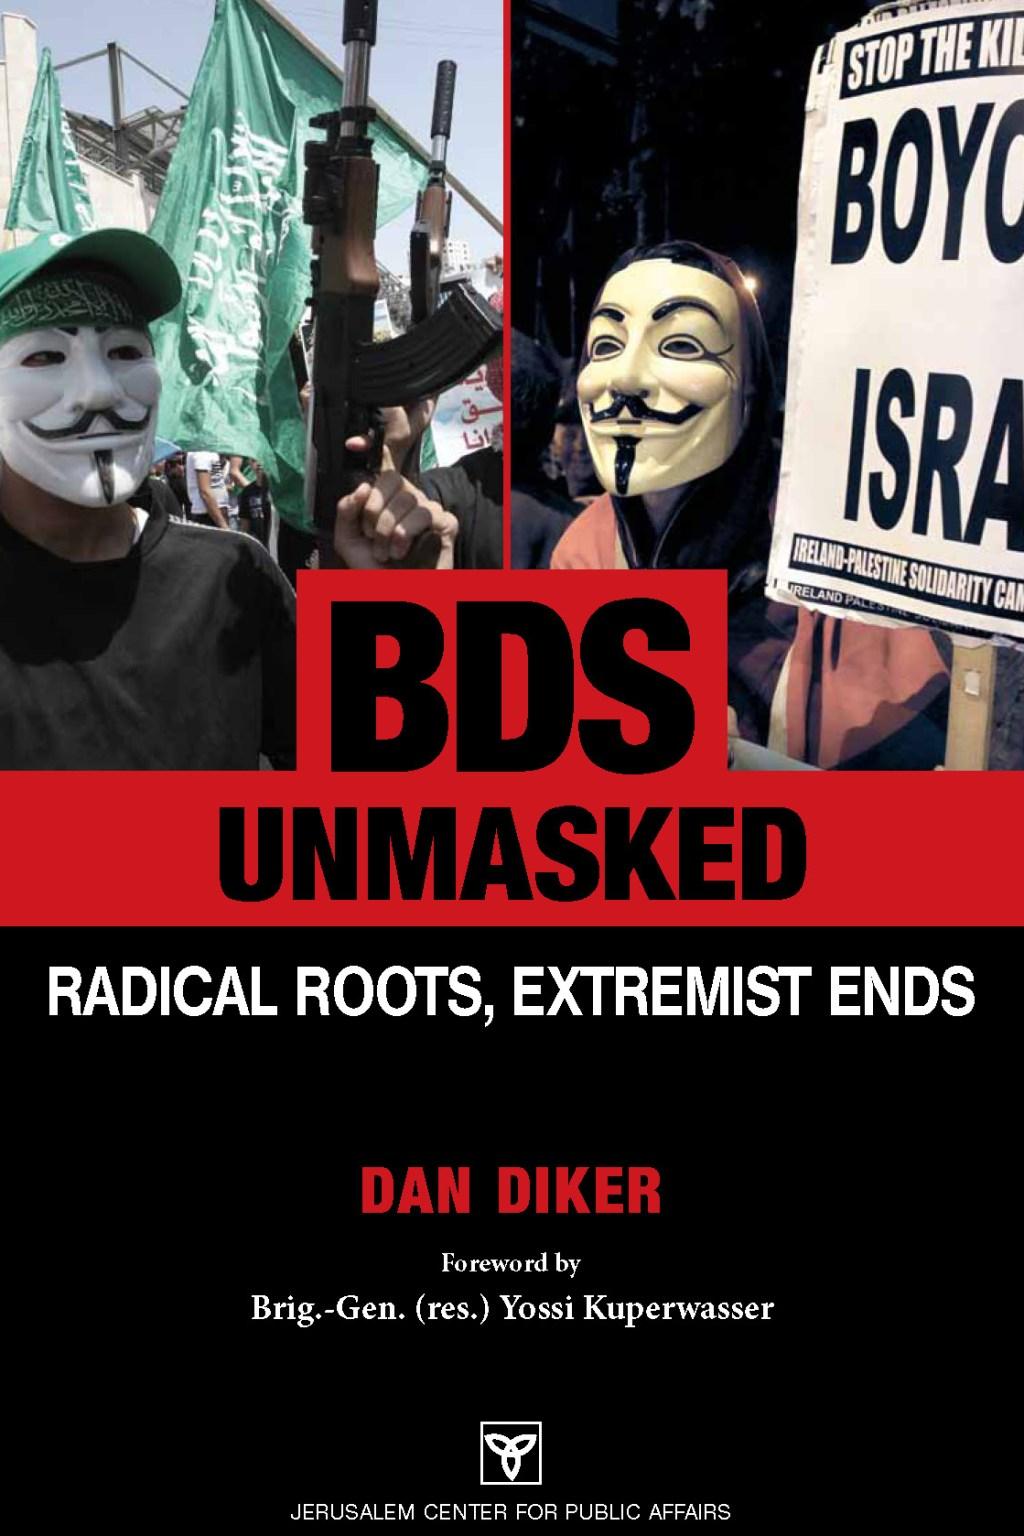 BDS Unmasked: Radical Roots, Extremist Ends